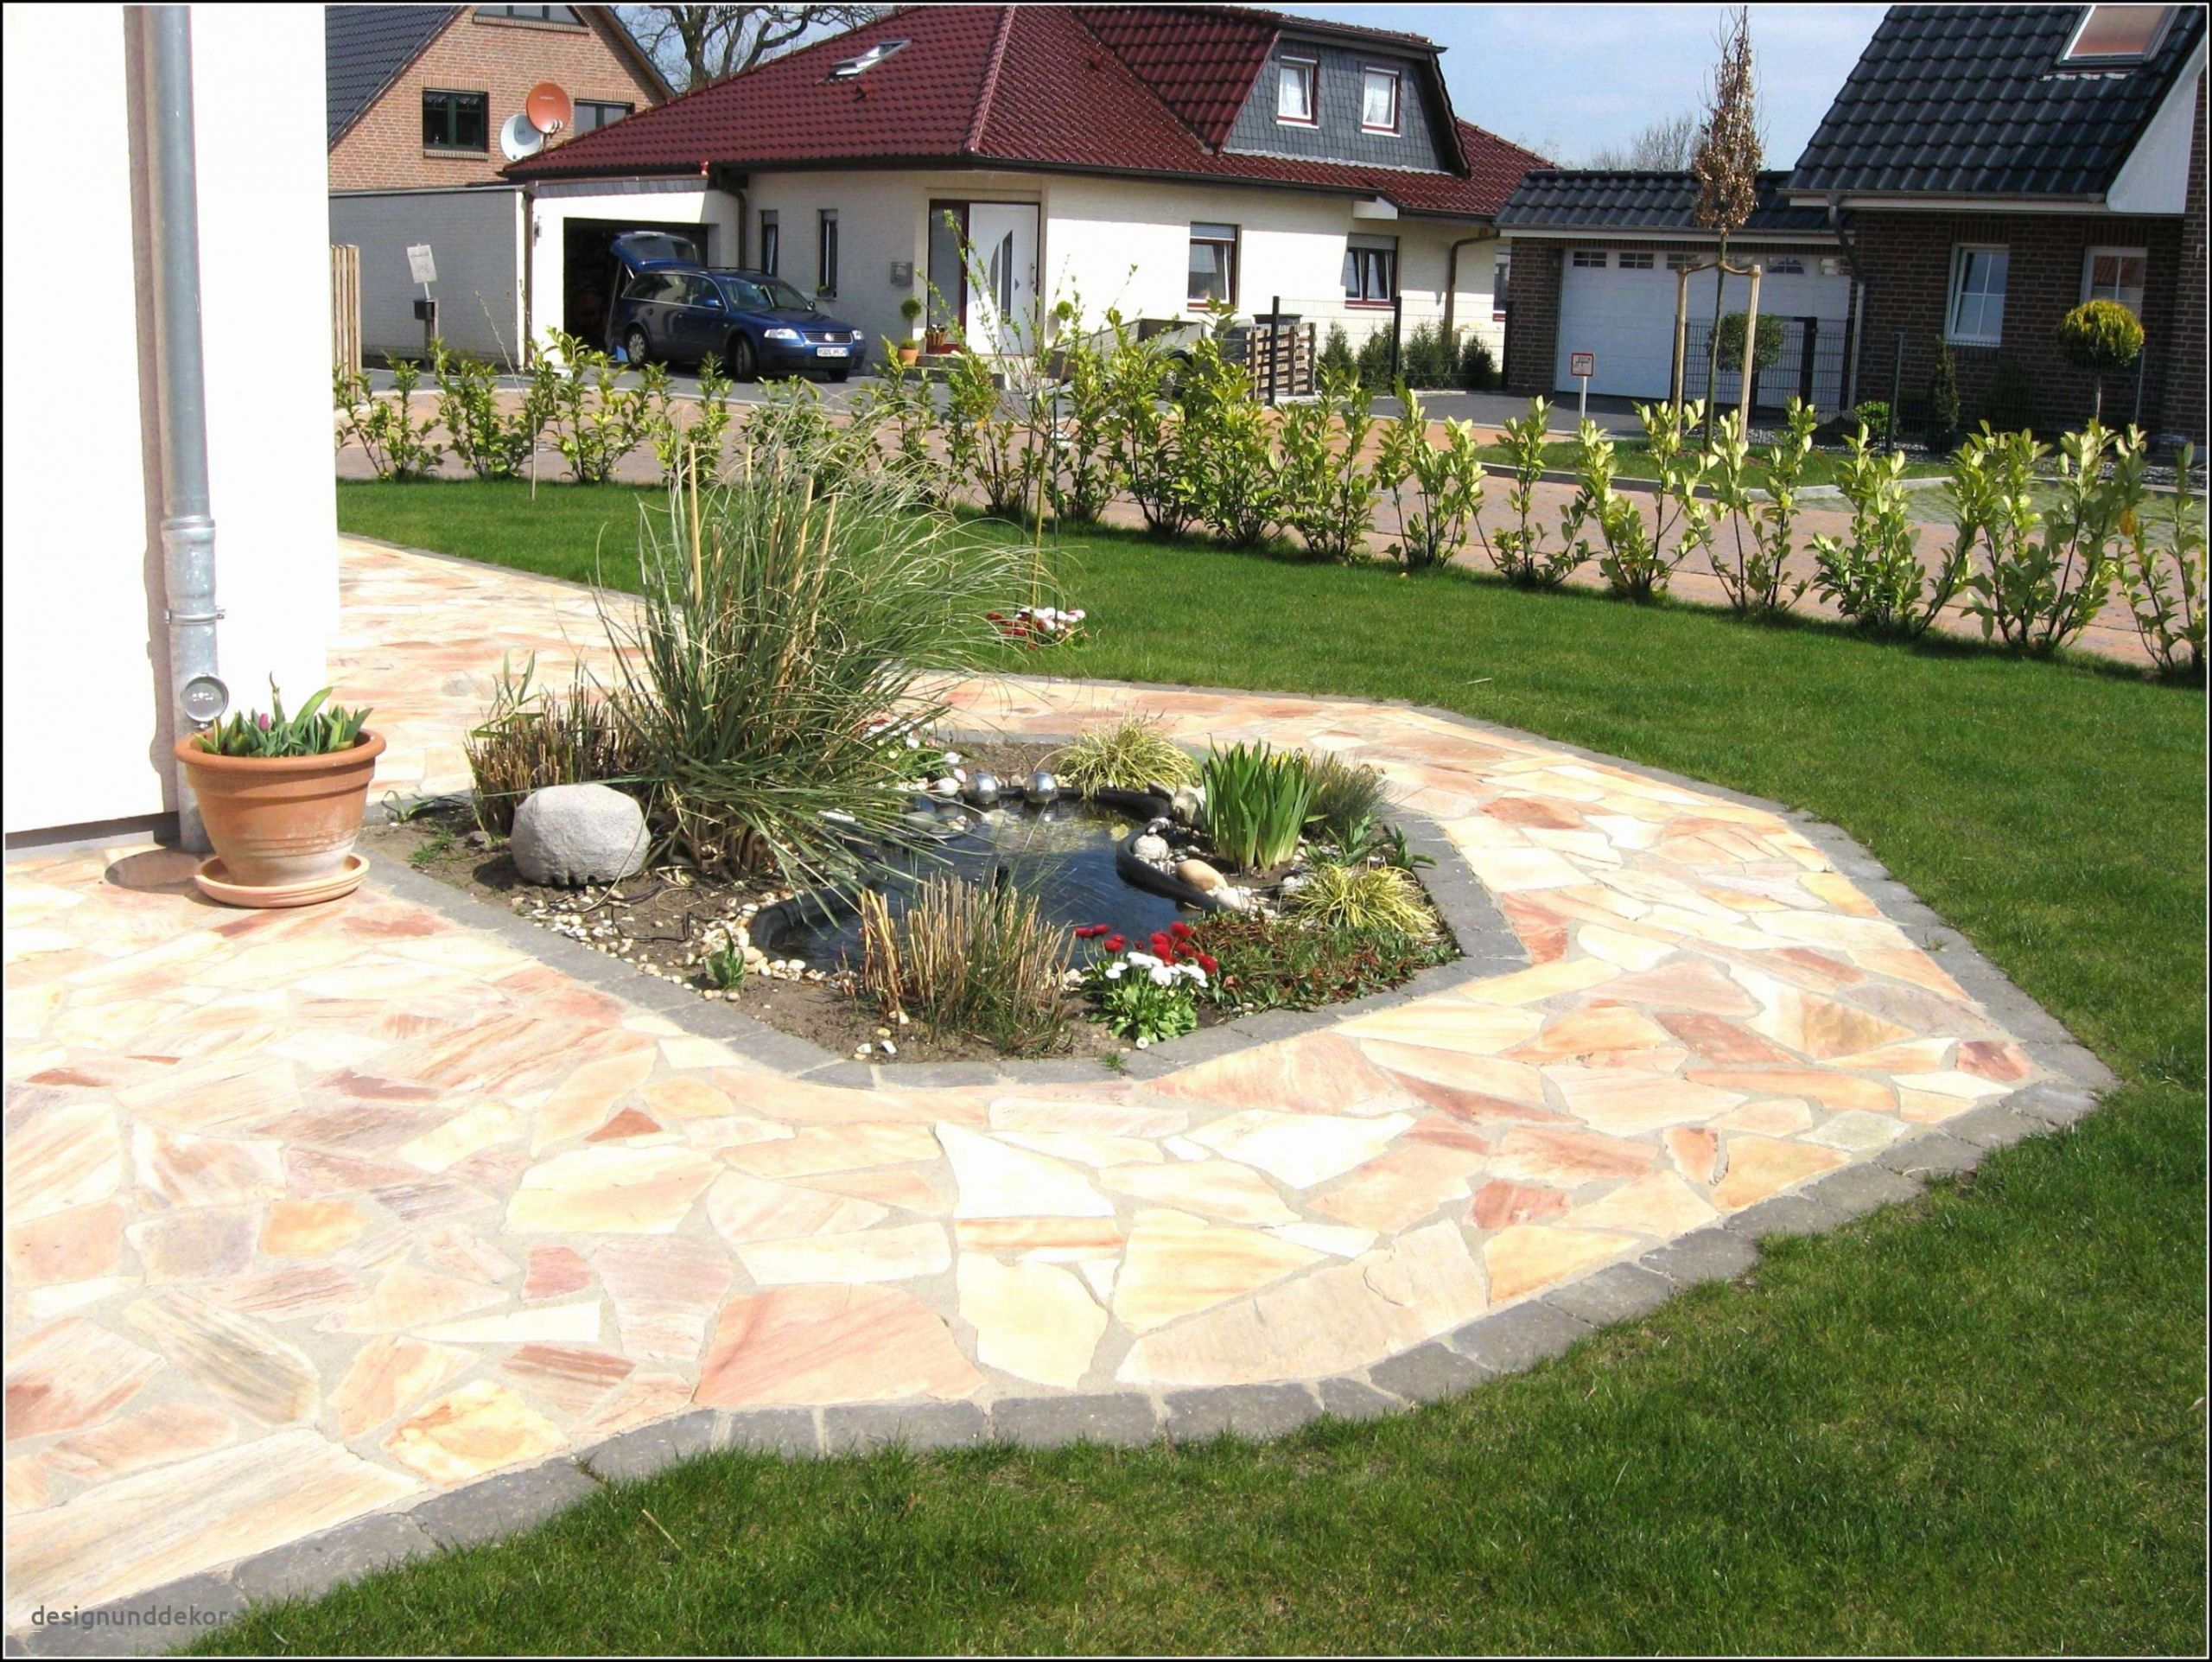 Gestaltungsideen Garten Einzigartig Garten Gestalten Ideen — Temobardz Home Blog